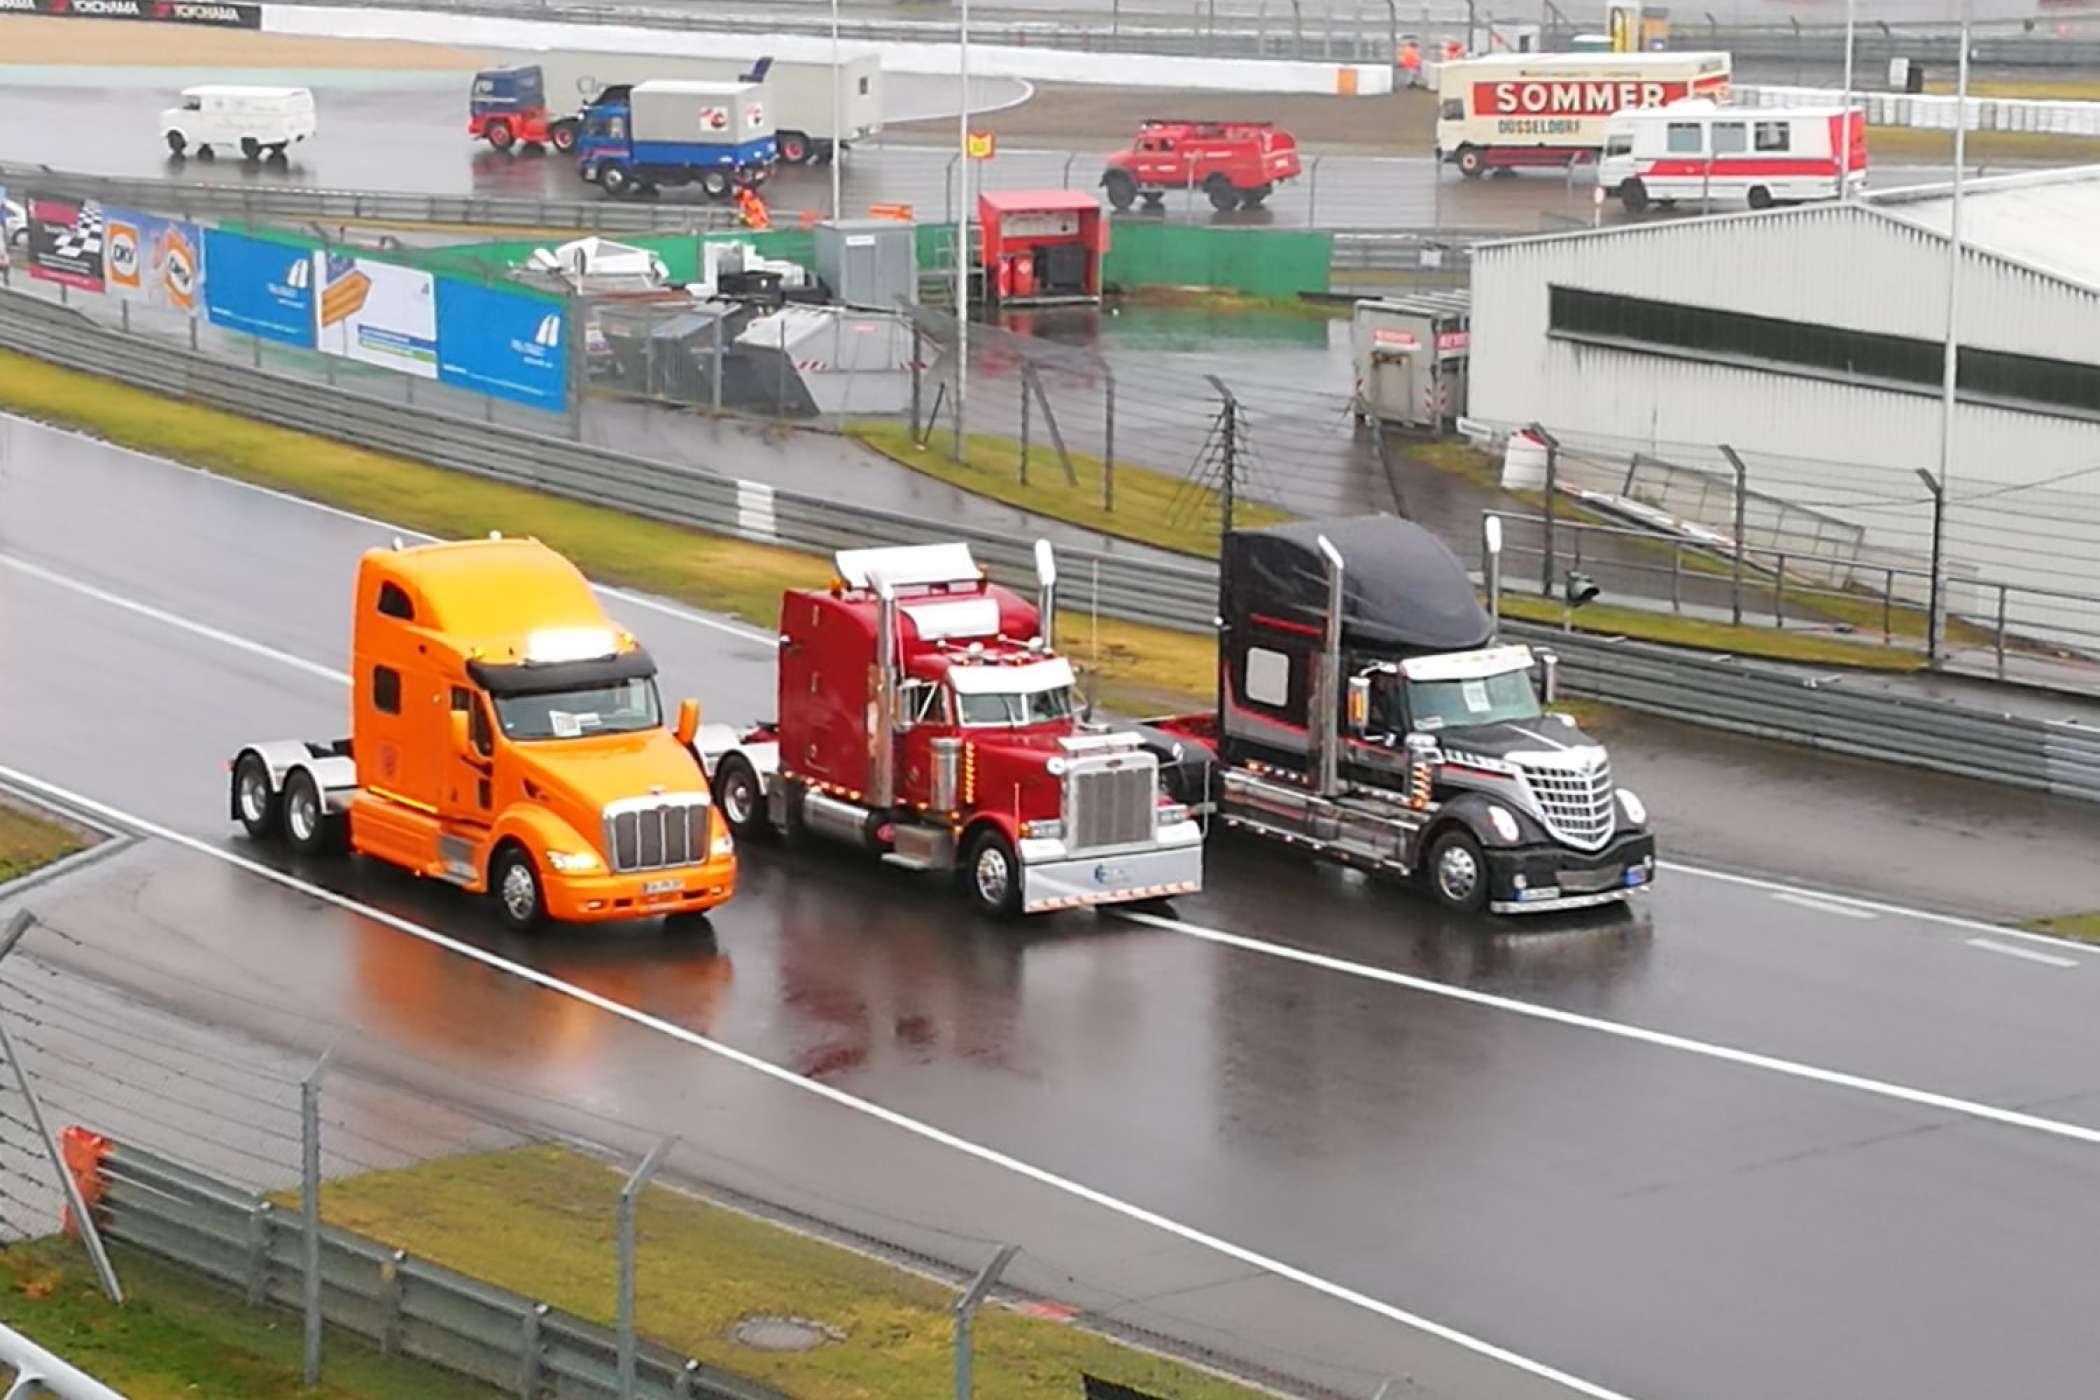 Truck Grand Prix 2017 Corso Am Samstag Adac Truck Grand Prix